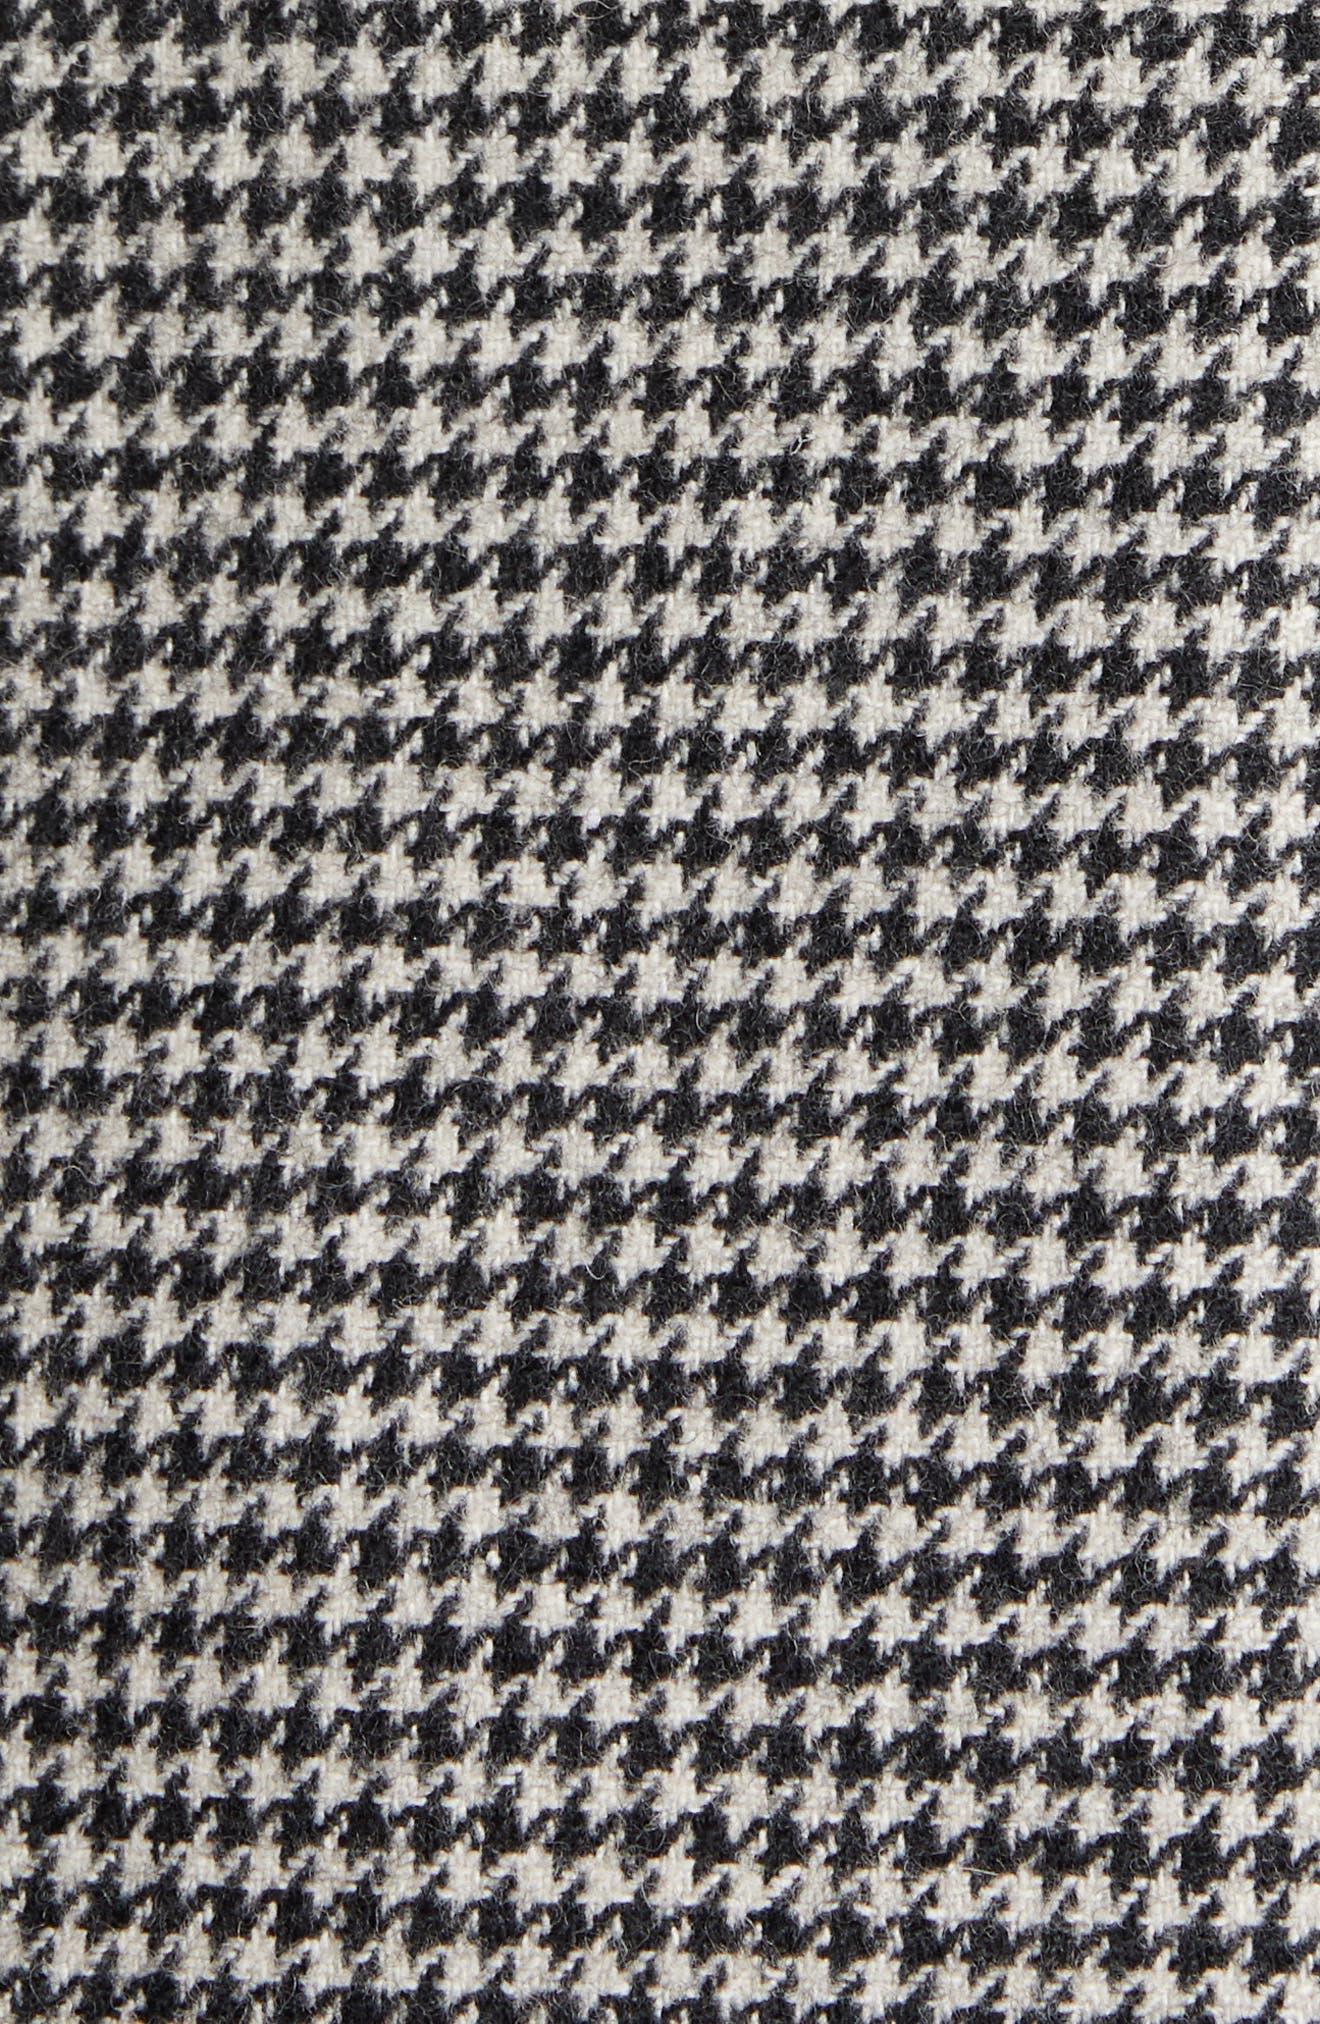 Nili Lotan Coats Humphrey Wool Blend Jacket